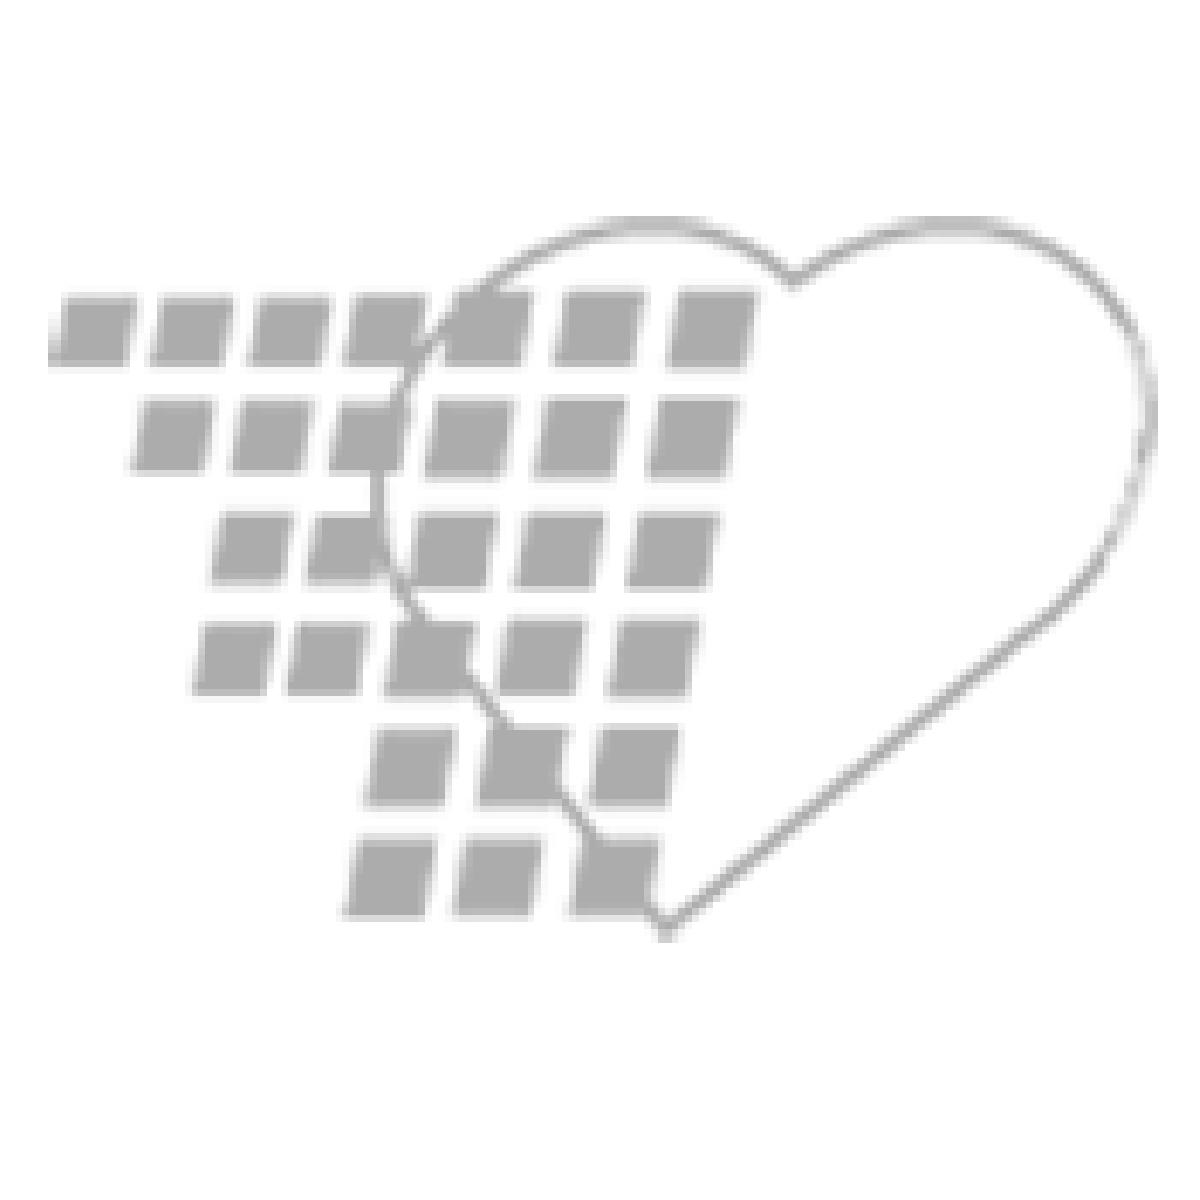 11-81-0058 Prostate Examination Trainer